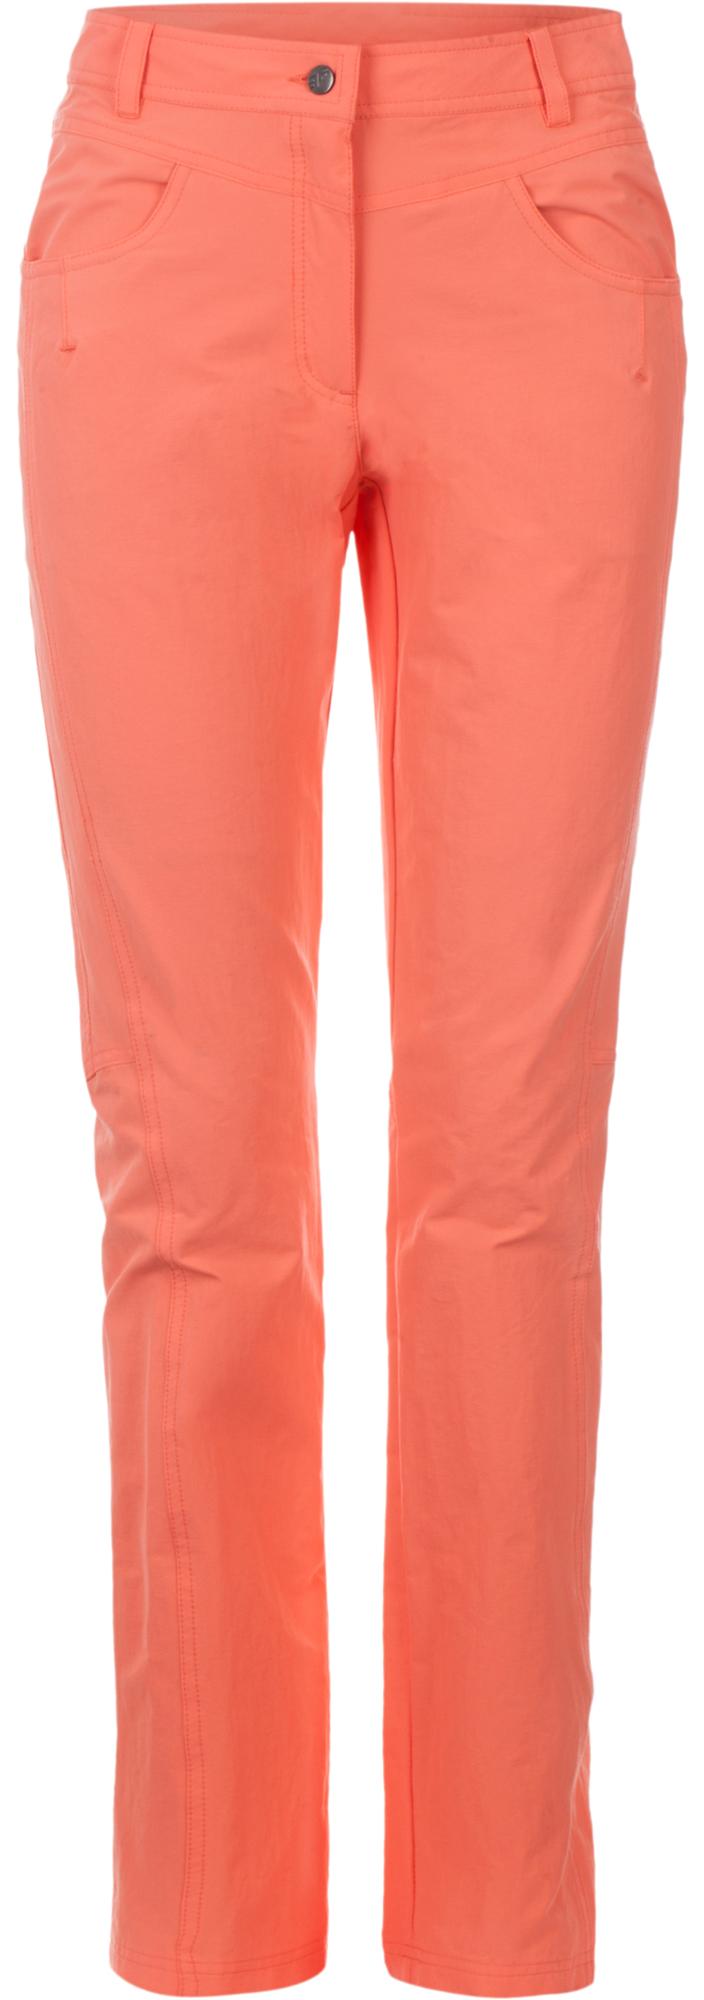 IcePeak Брюки женские IcePeak Lisbet брюки женские icepeak savita цвет темно синий 654020542iv размер 46 52